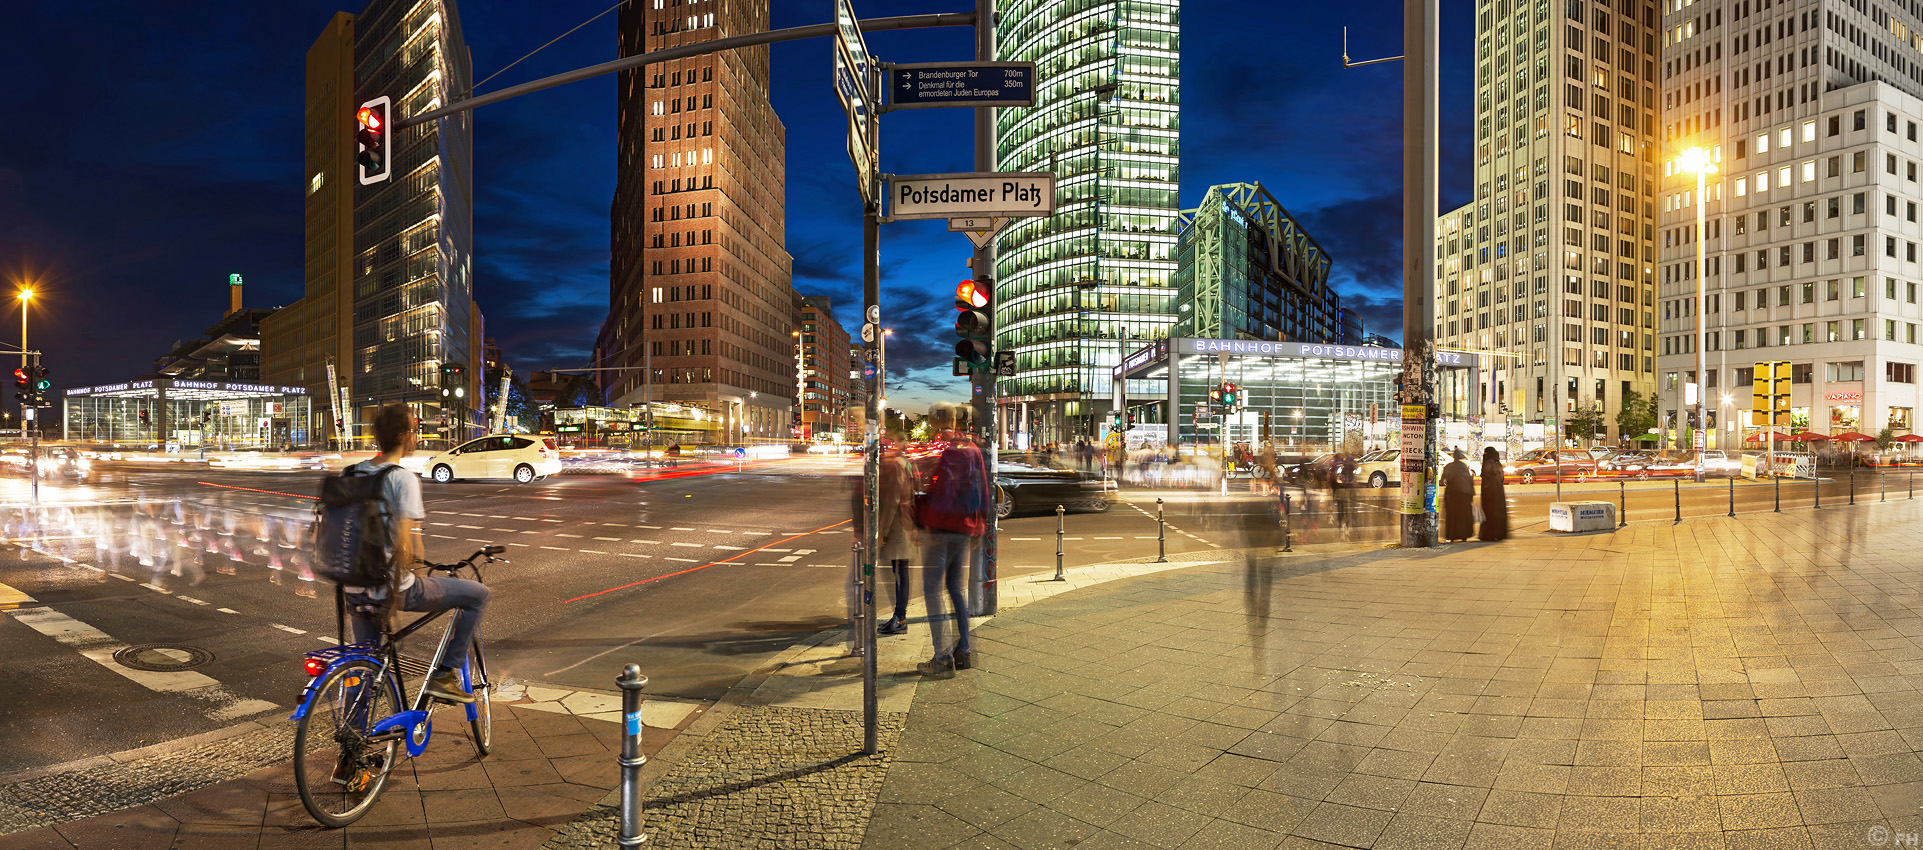 PotsPlatz_citylights_Pano1_k